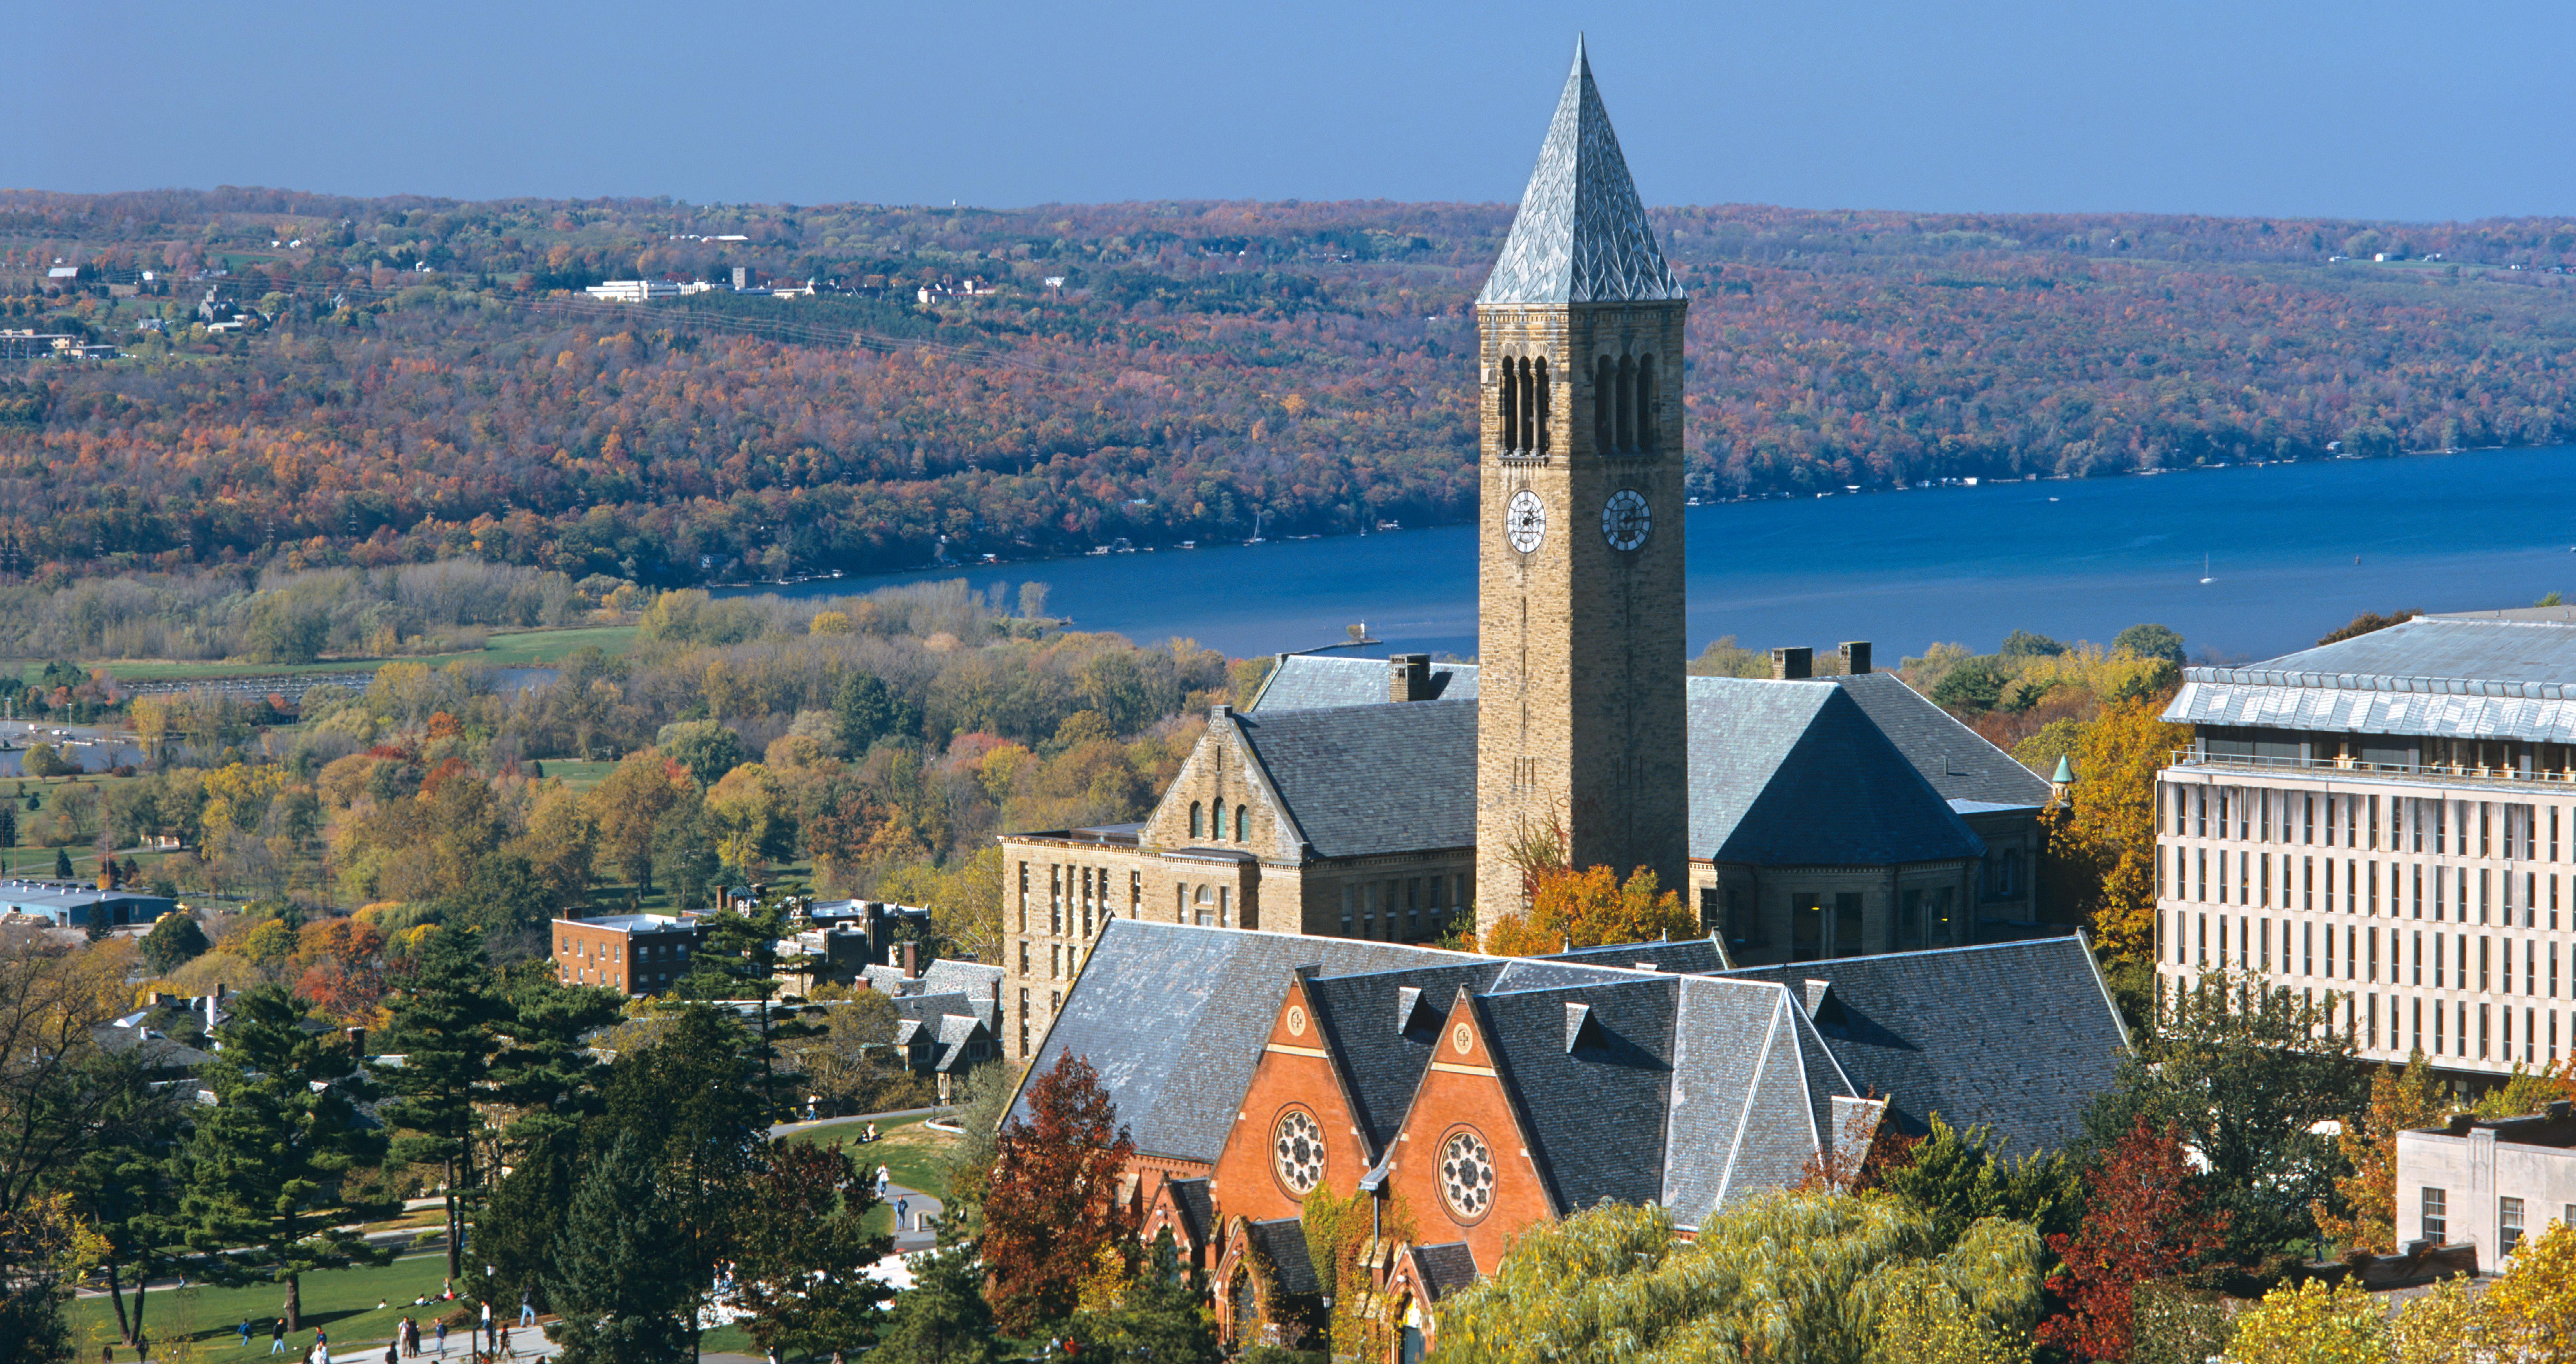 Cornell 康乃爾大學 - 山環水繞,環境清幽,彷彿置身童話的頂尖學府